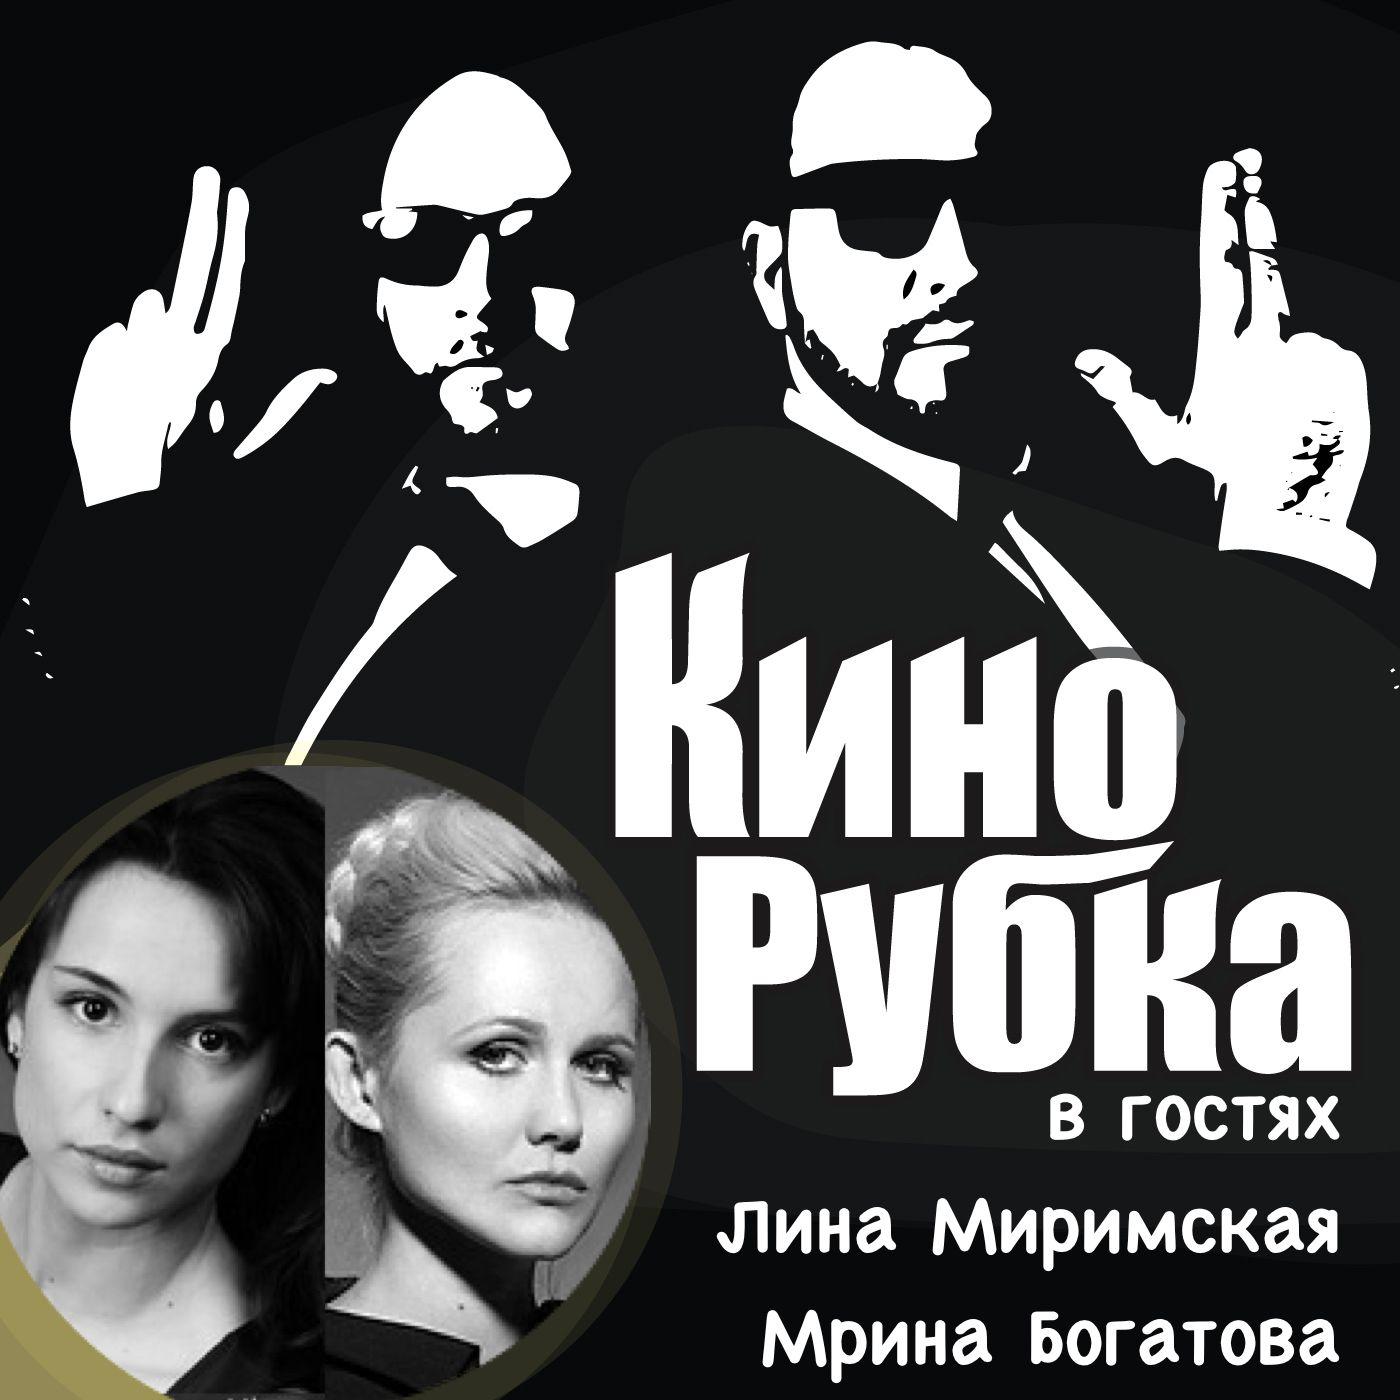 цена на Павел Дикан Актрисы театра и кино Лина Миримская и Марина Богатова